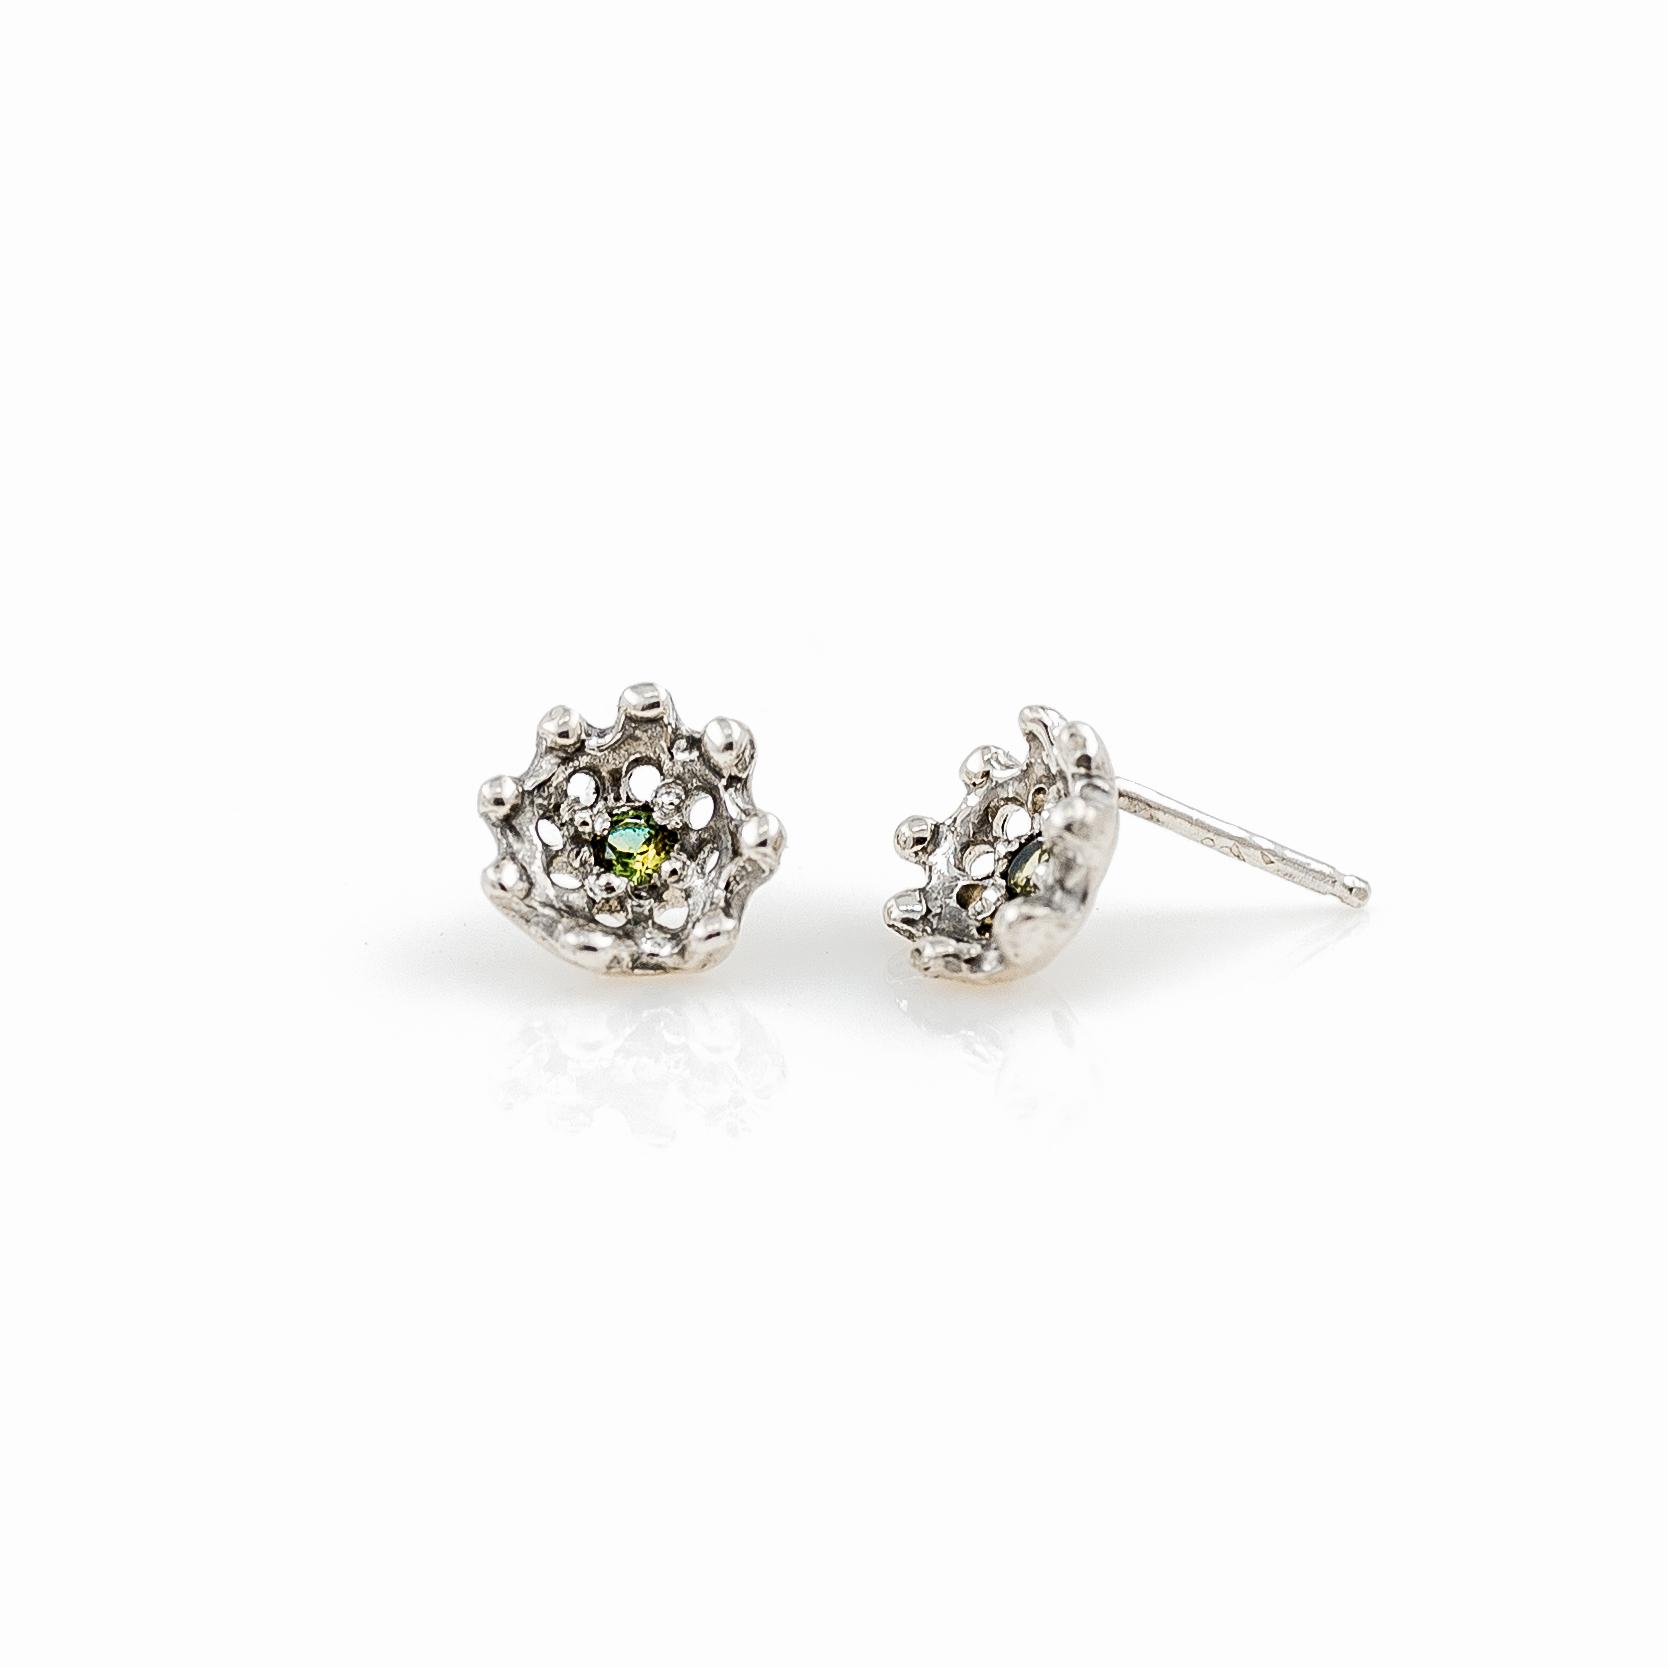 Small spike earrings Luke Maninov Hammond.jpg